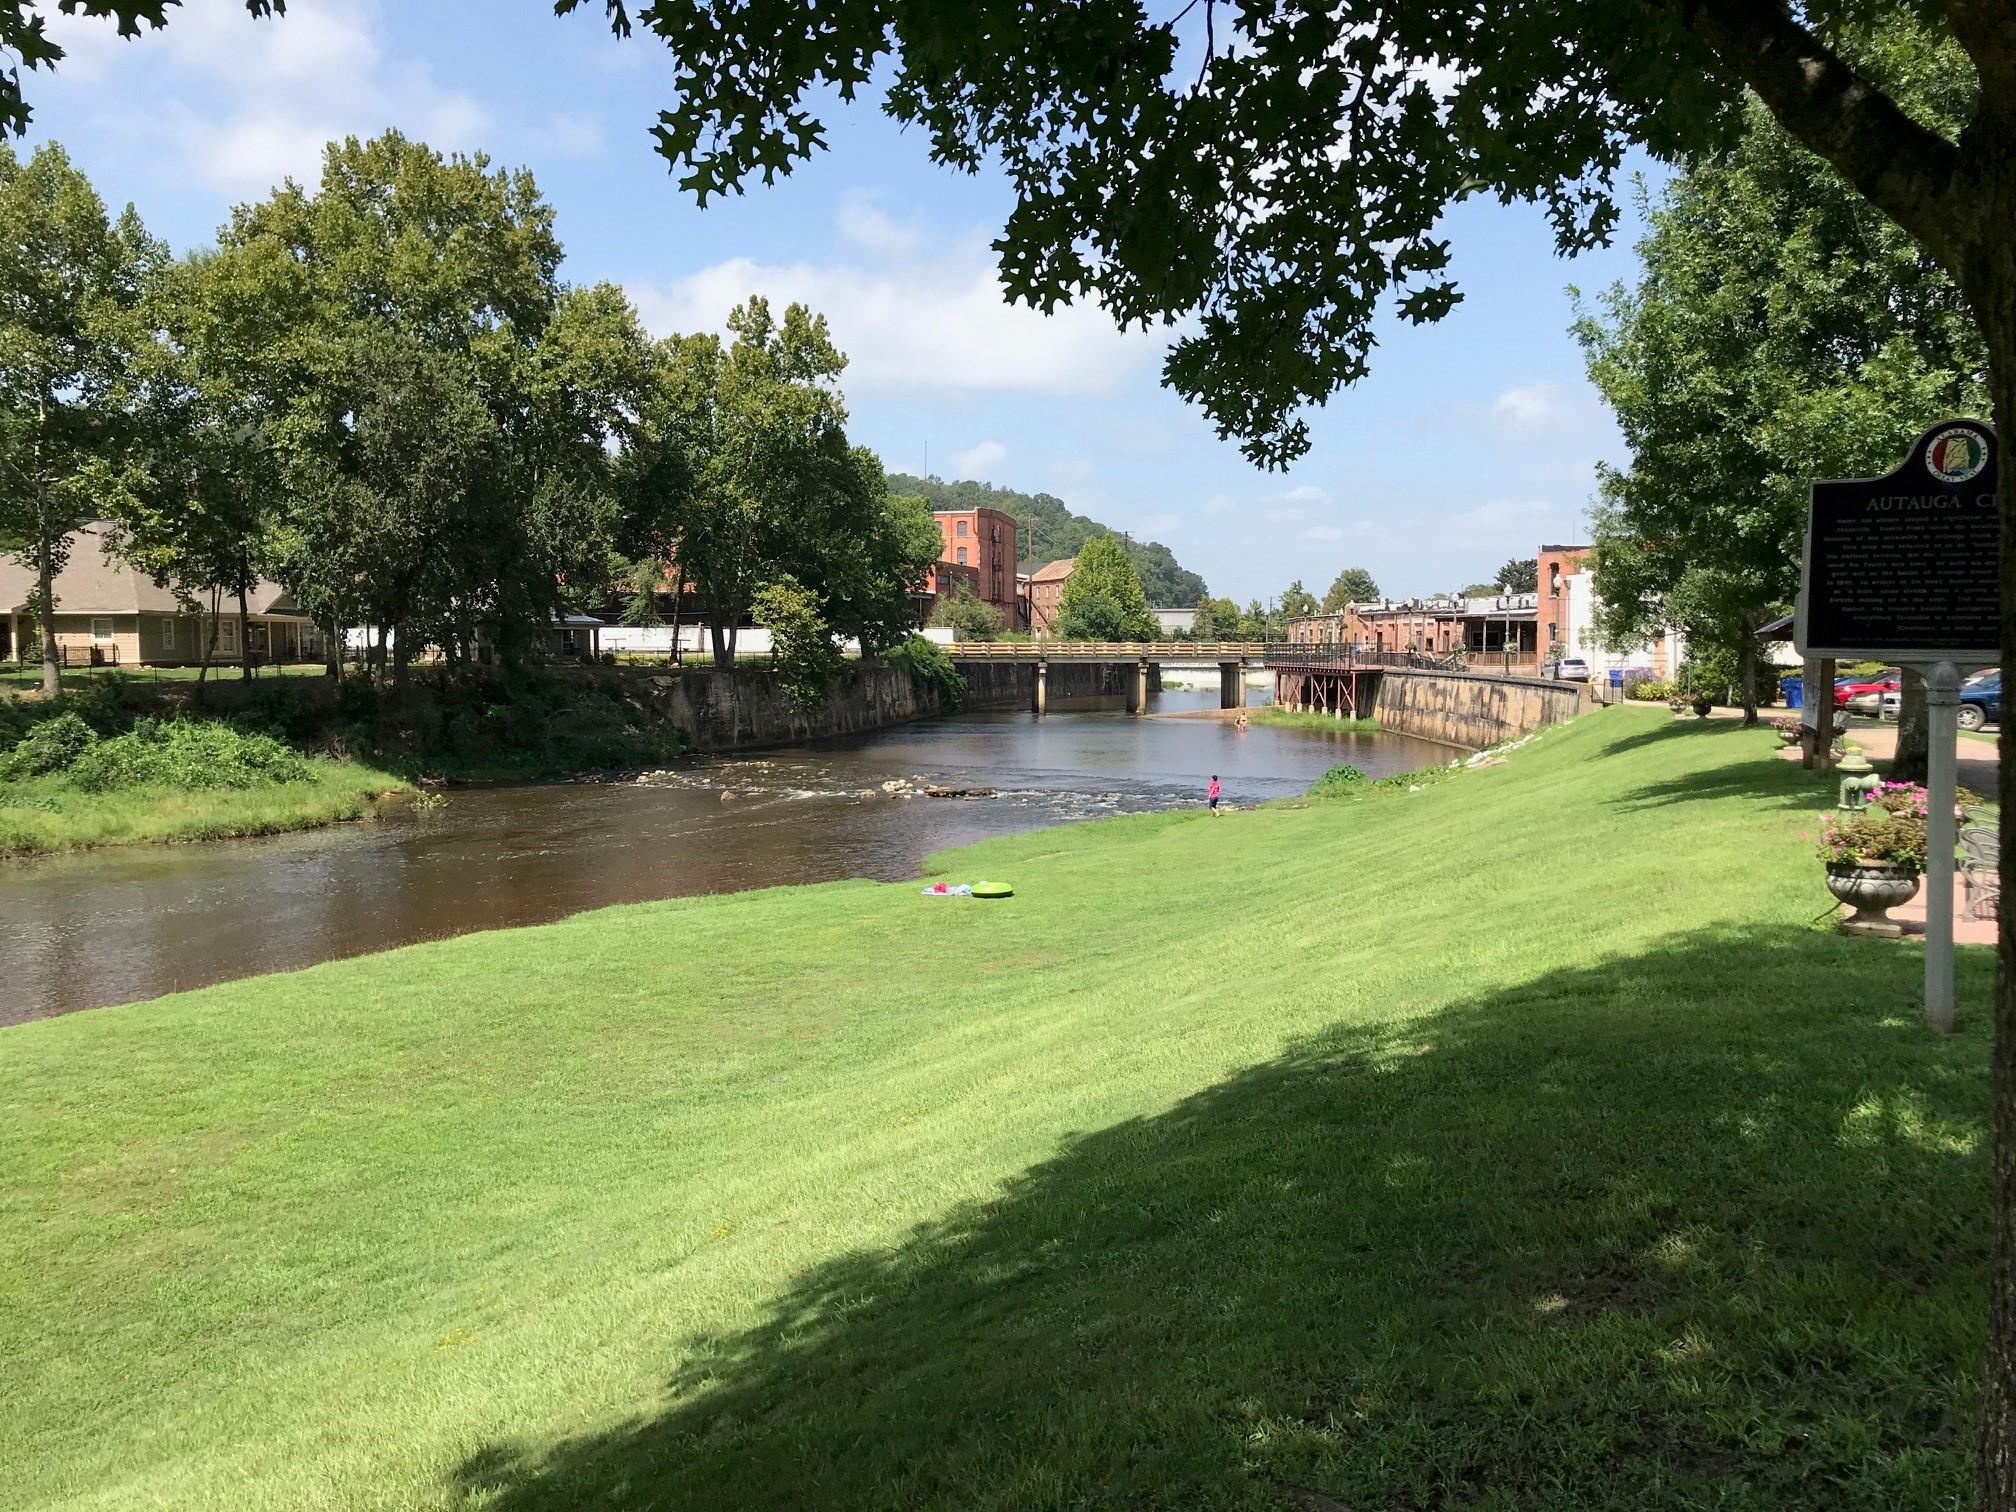 Danial Pratt Historic District in Prattville